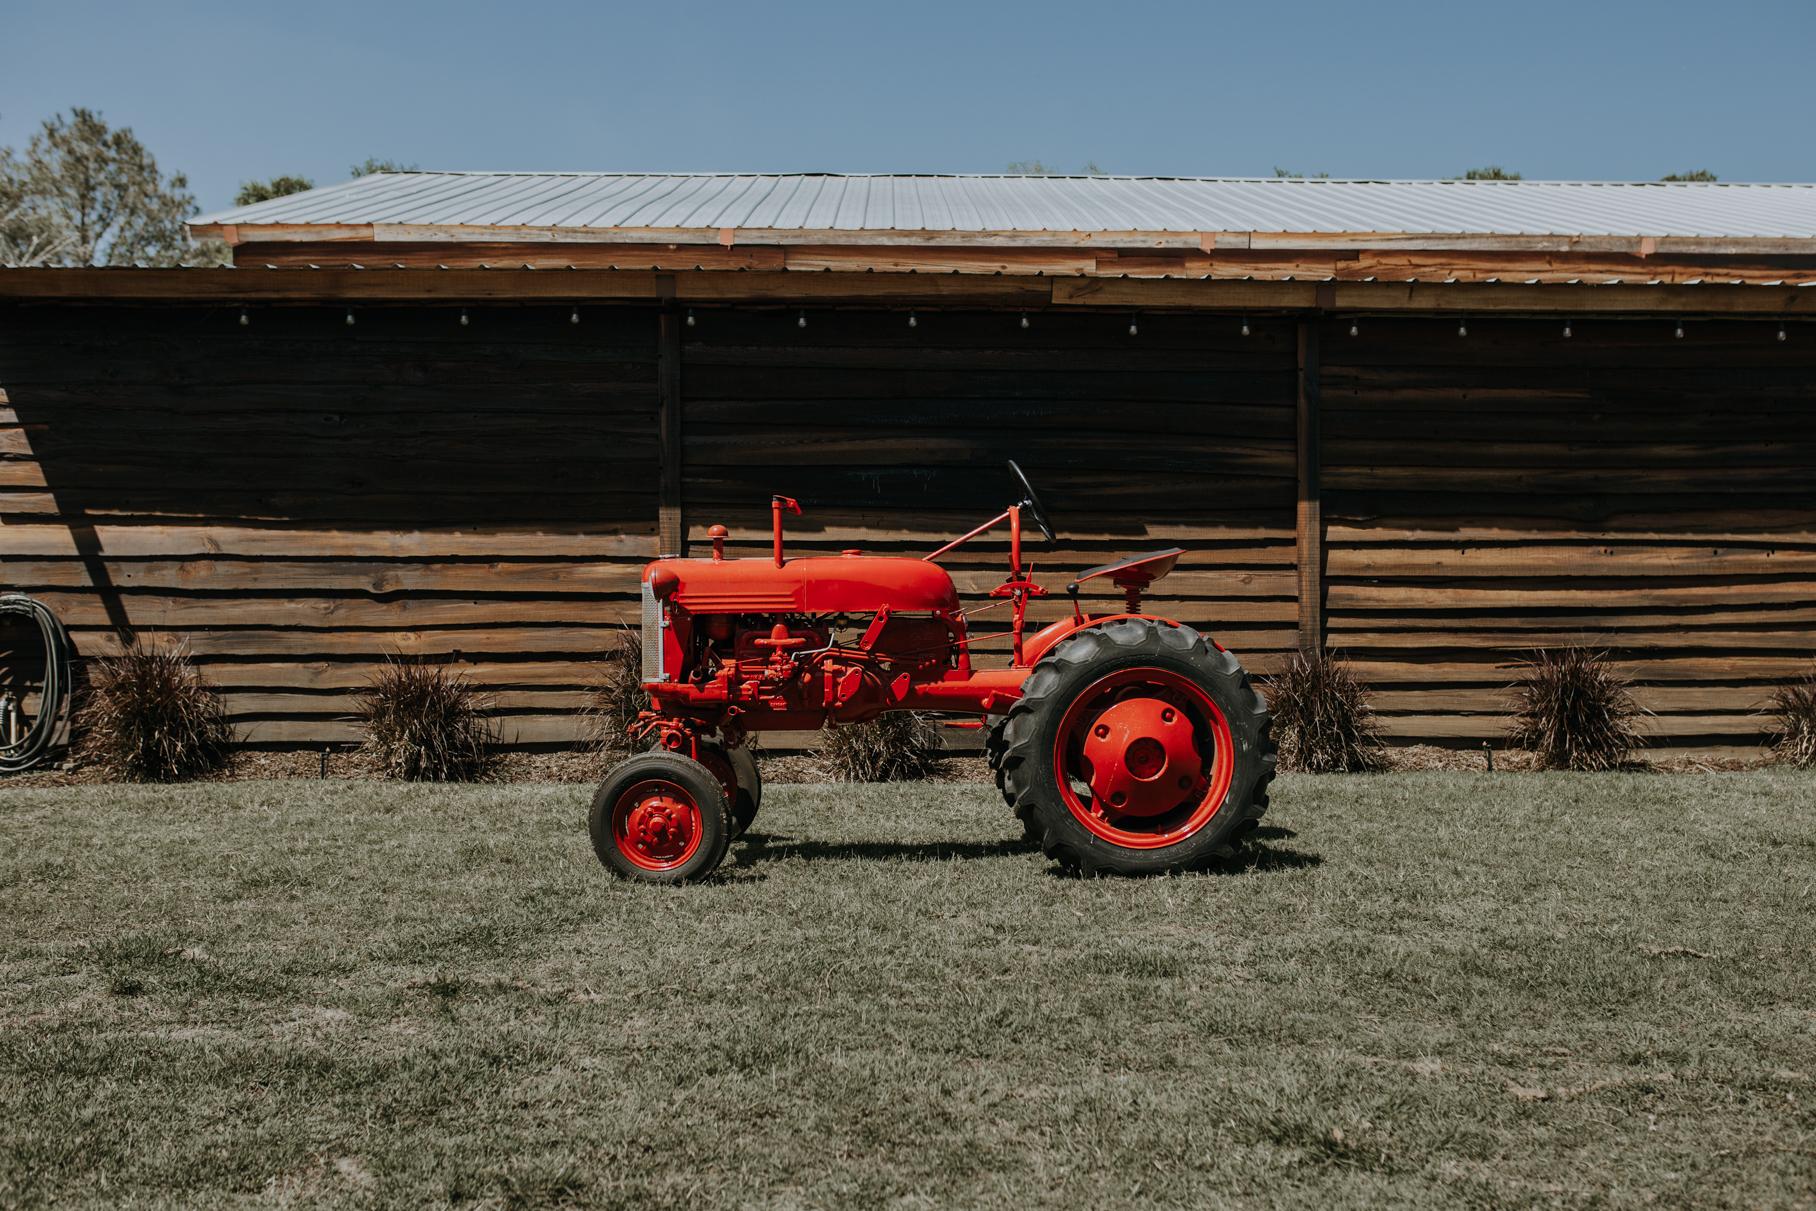 katie + chris | florida rustic barn wedding | prairie glenn barn wedding | tampa wedding photographer